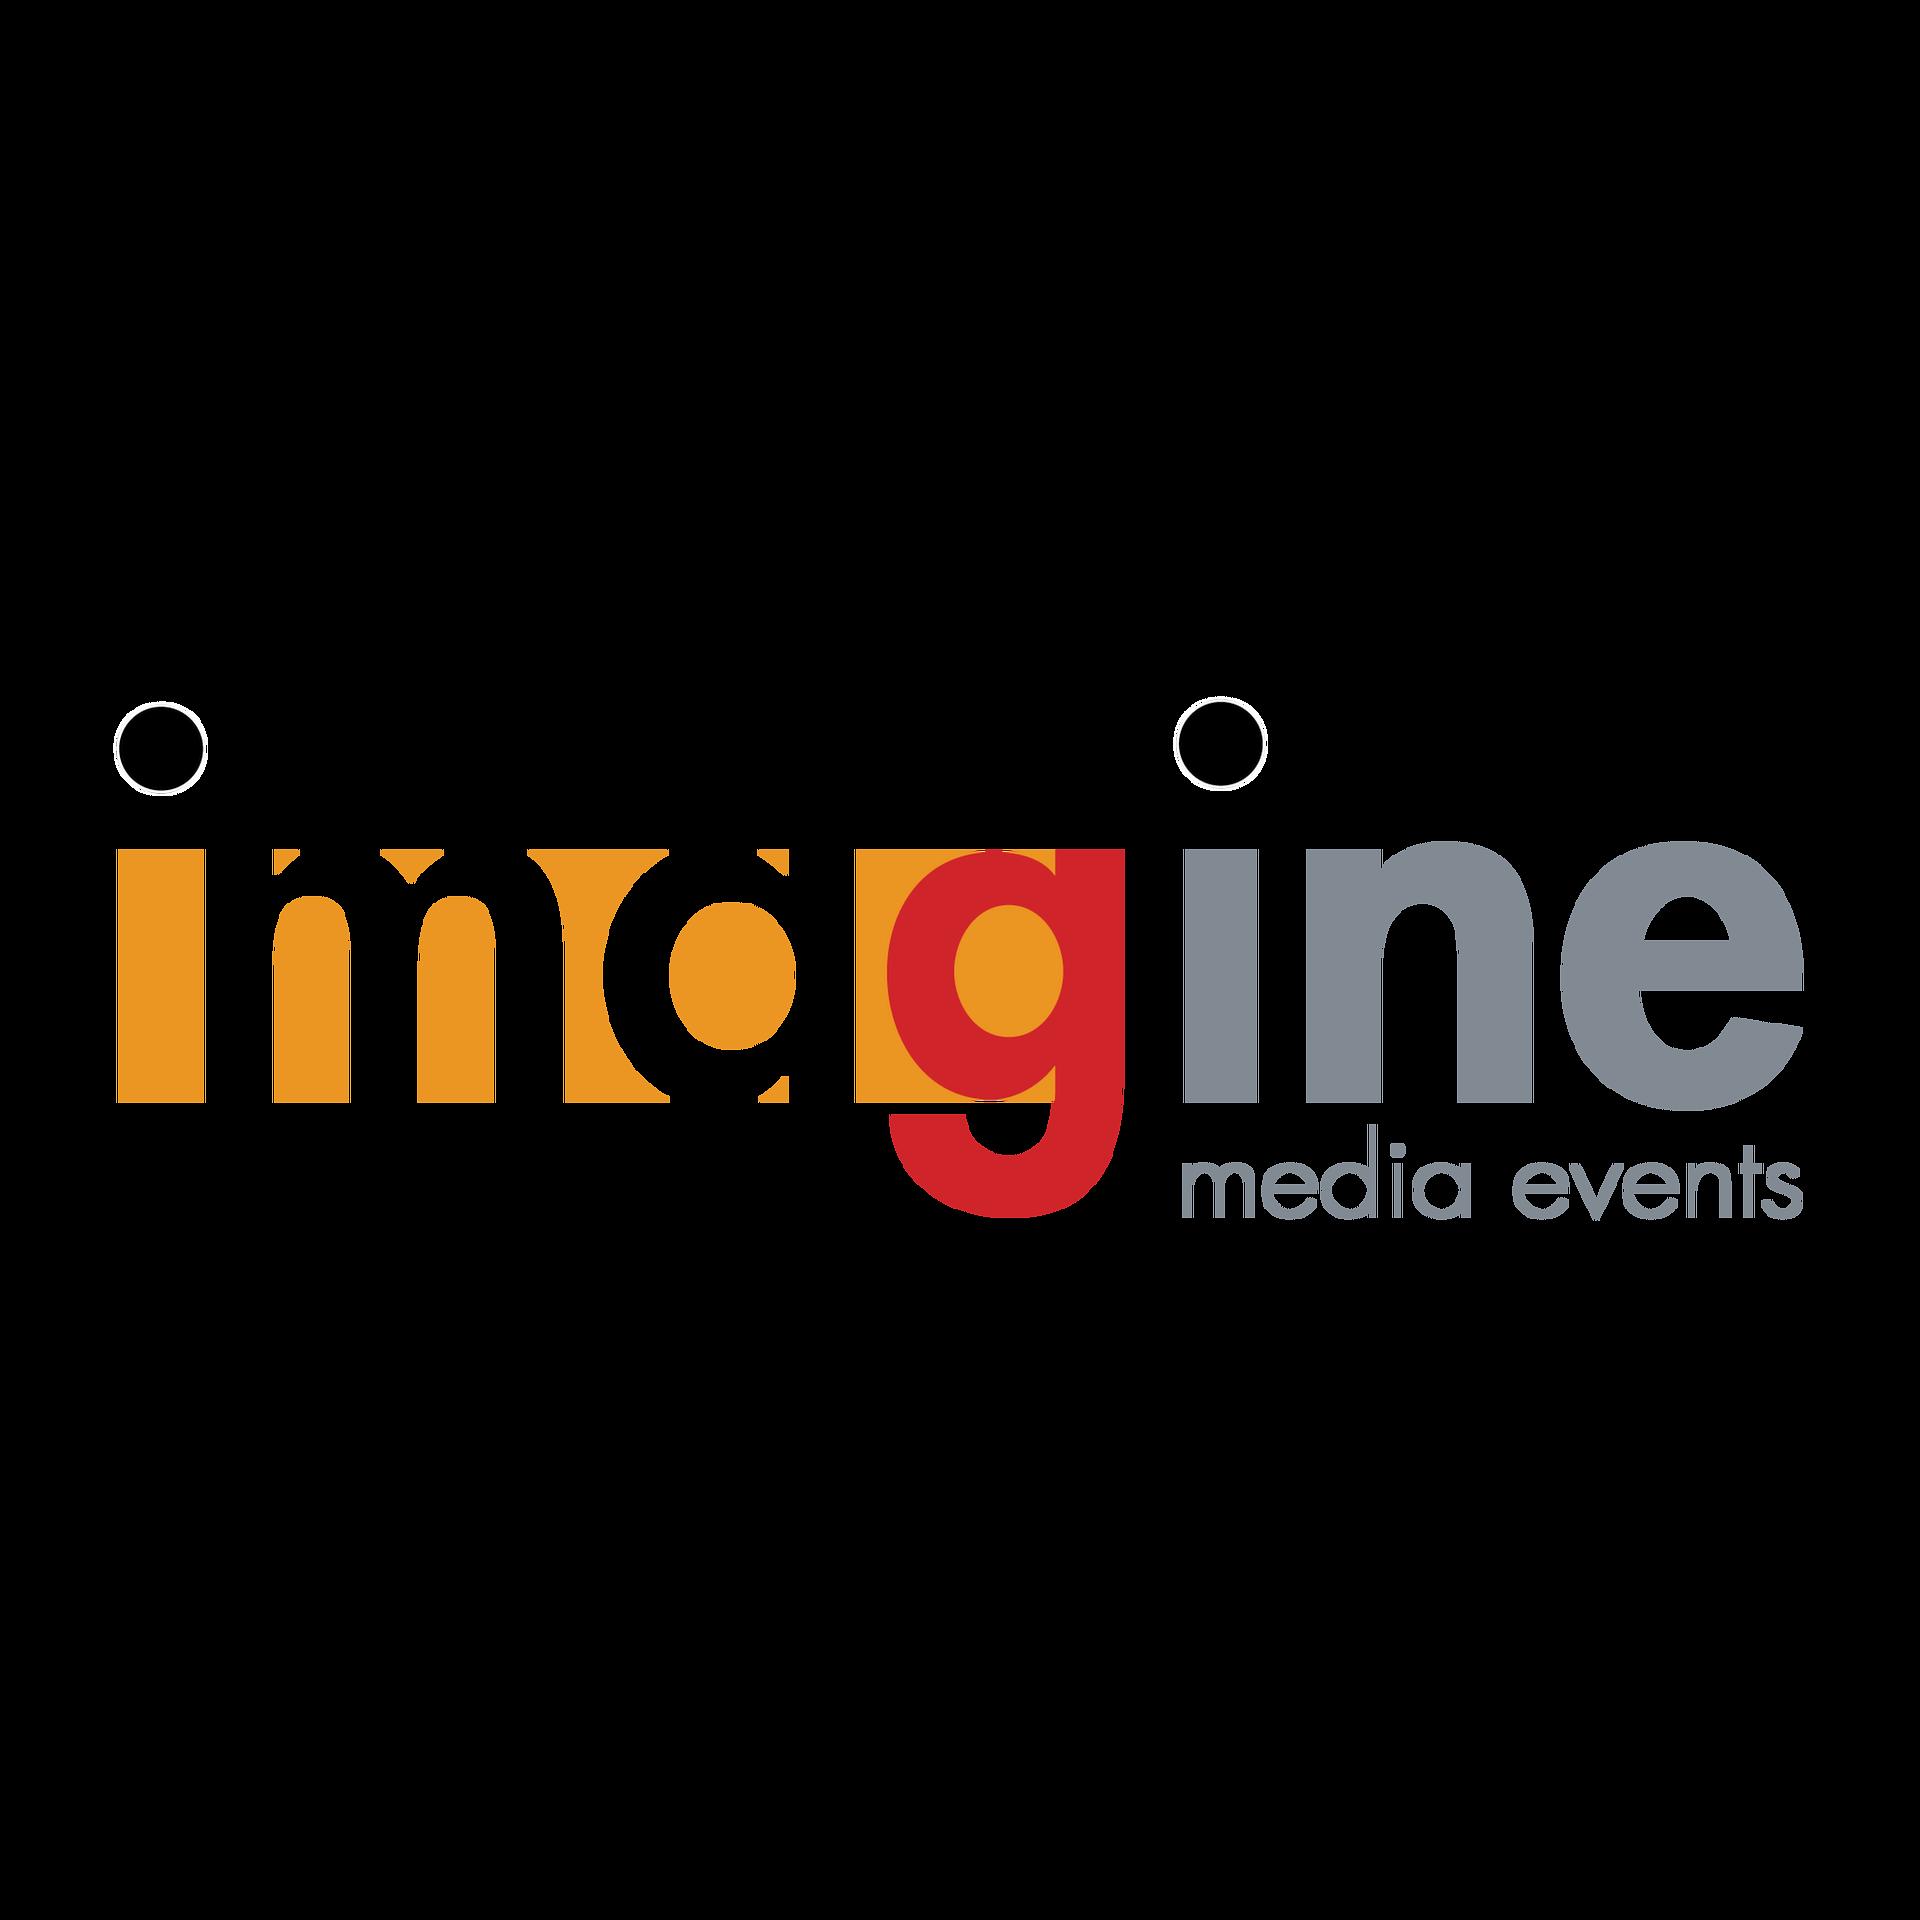 Imagine Media Events